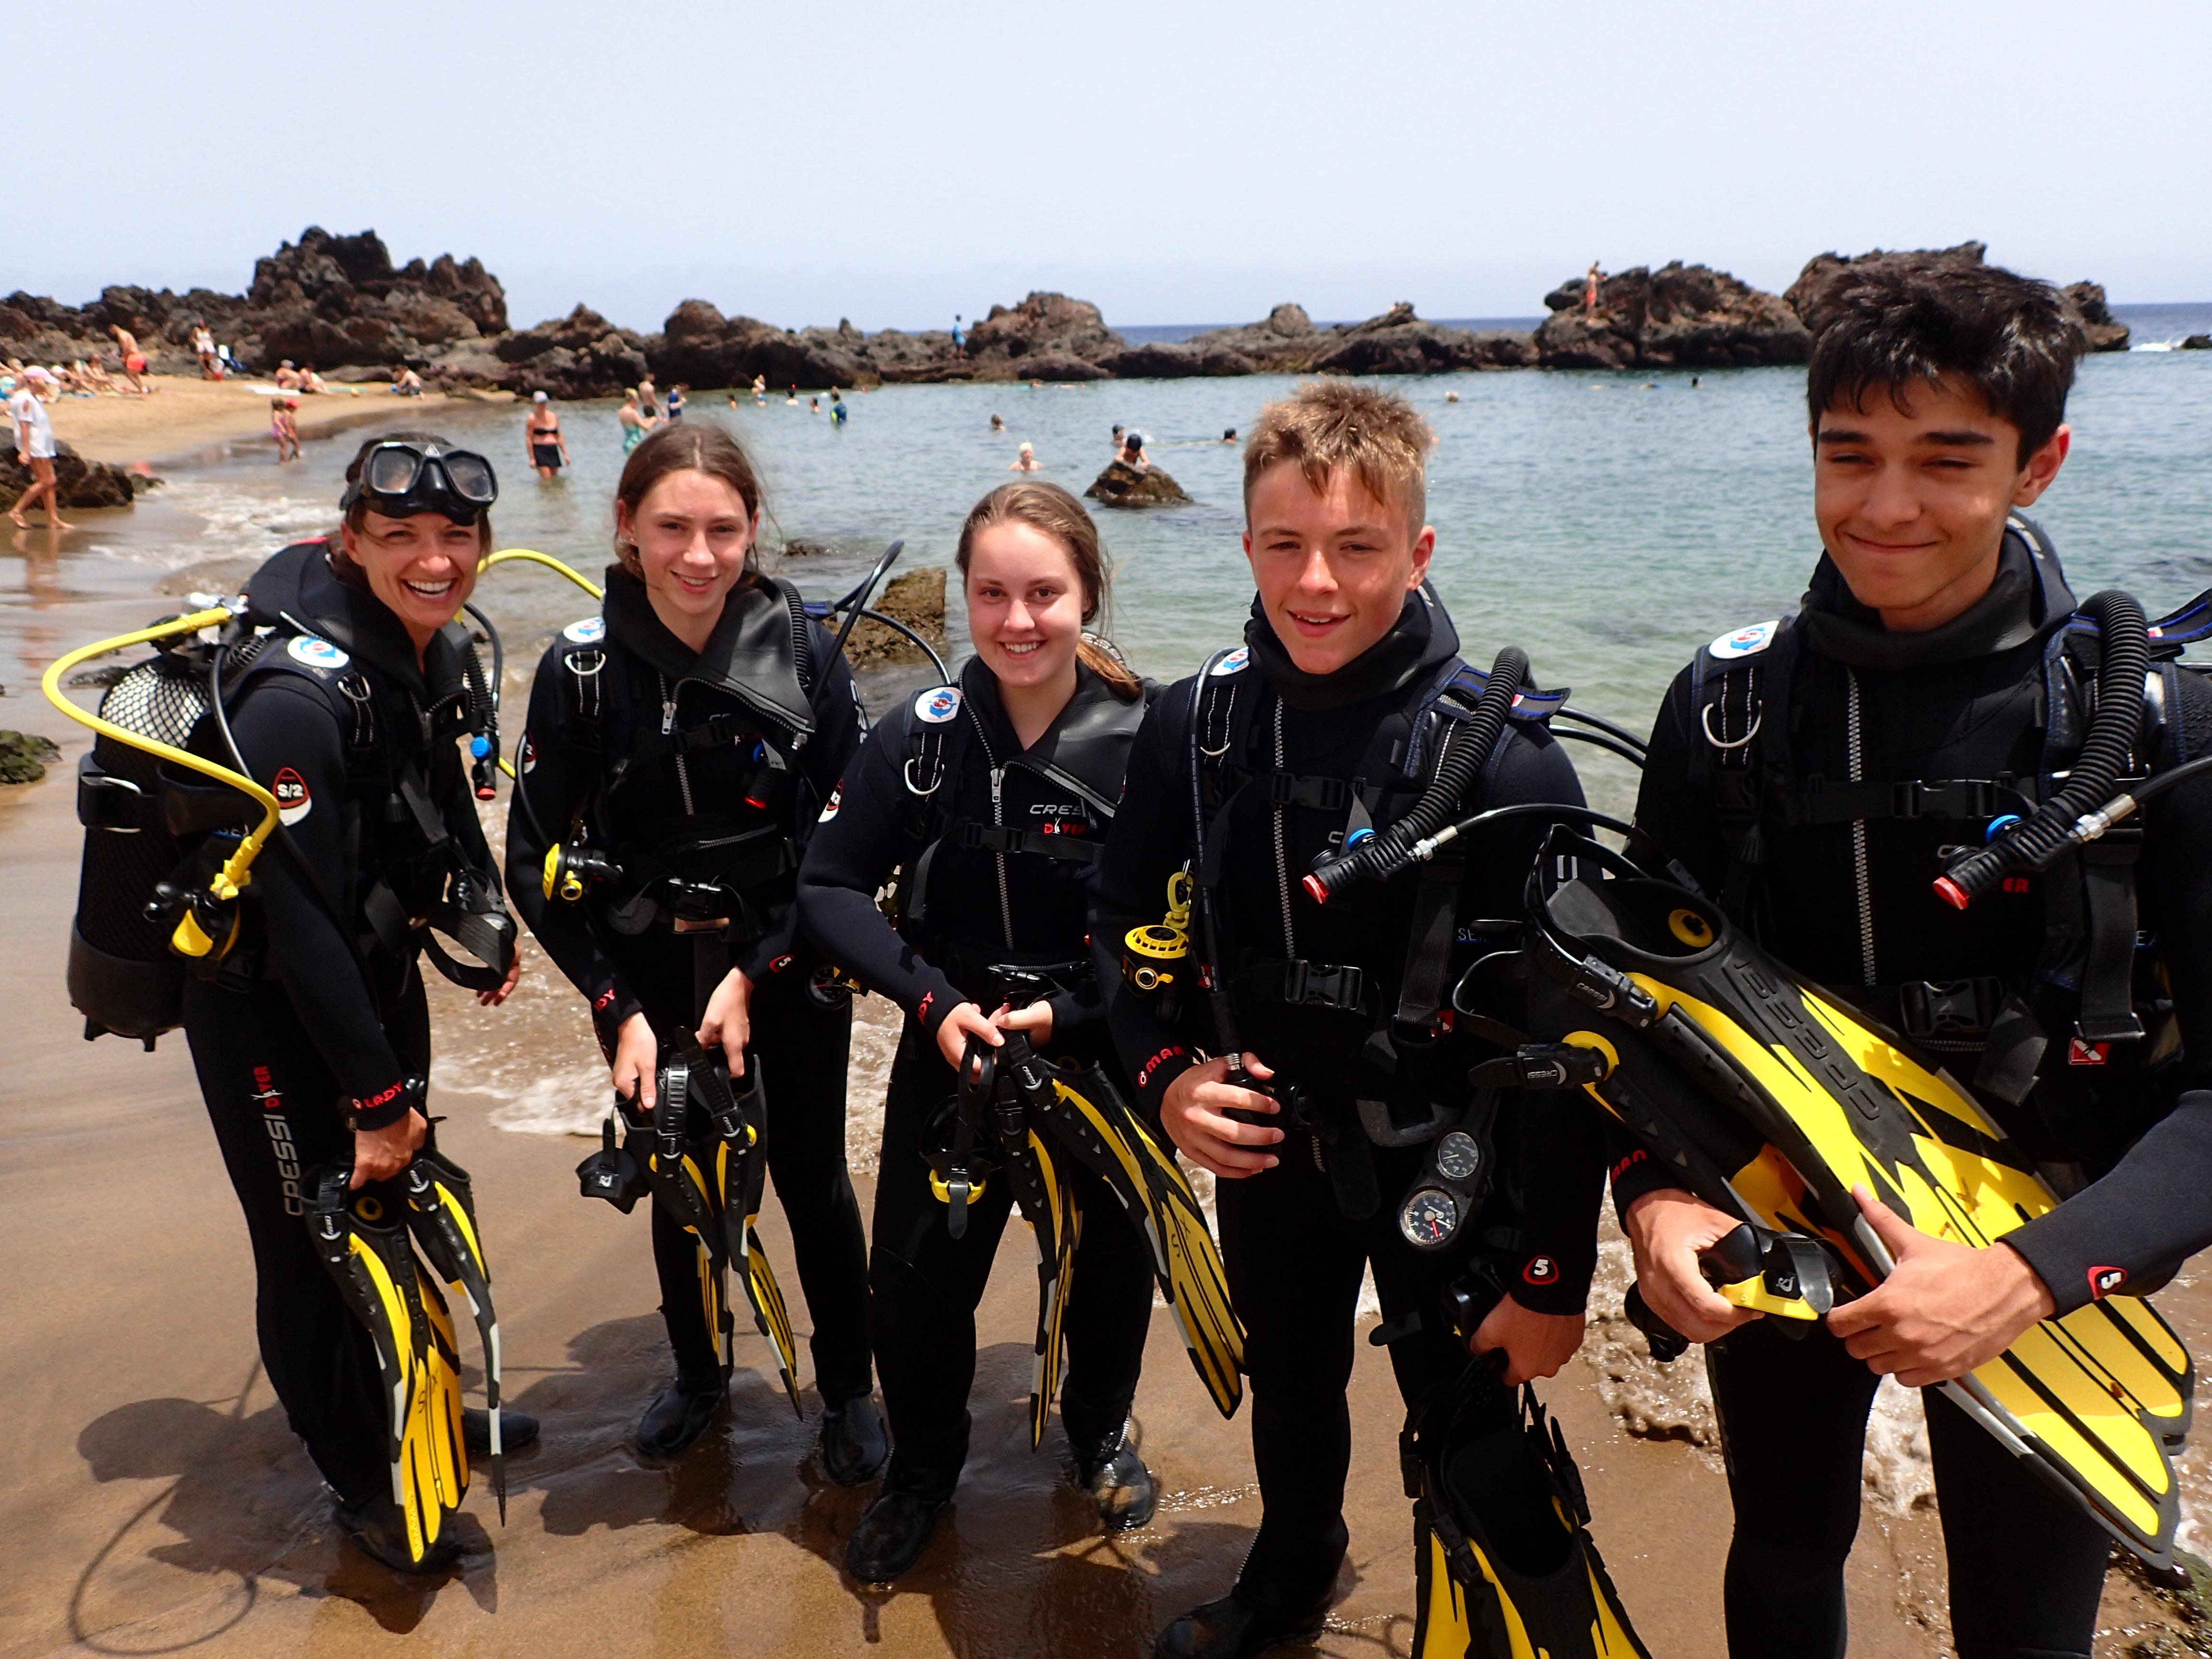 Bridgewater snorkelling club